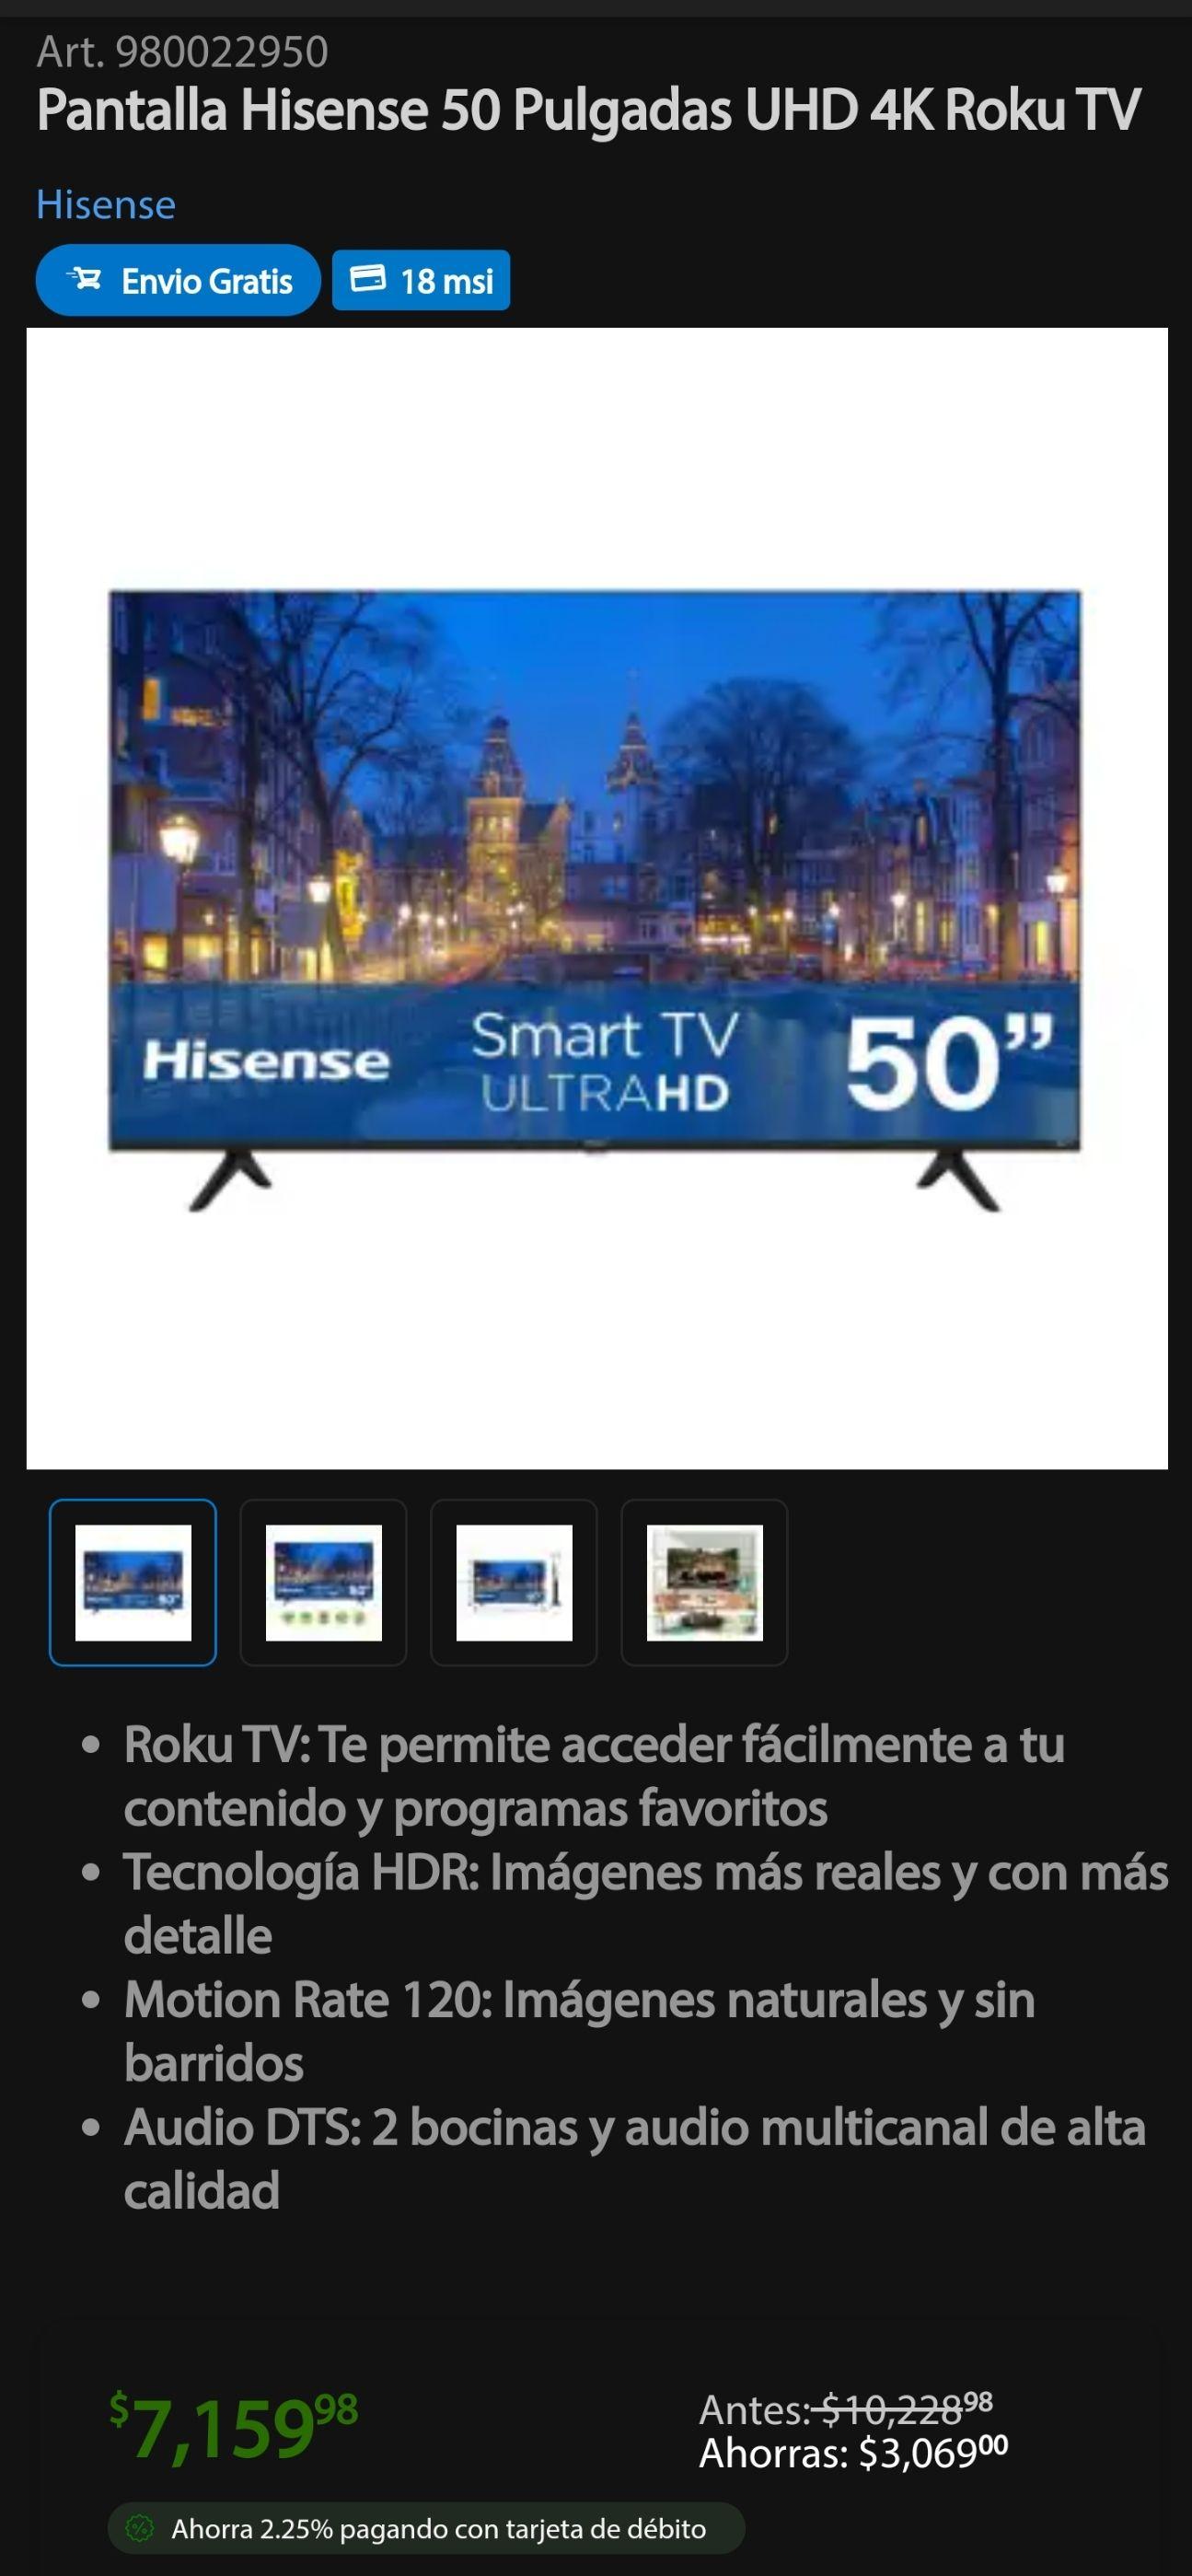 Sam's Club: Pantalla Hisense 50 Pulgadas UHD 4K Roku TV (2020) R6000GM